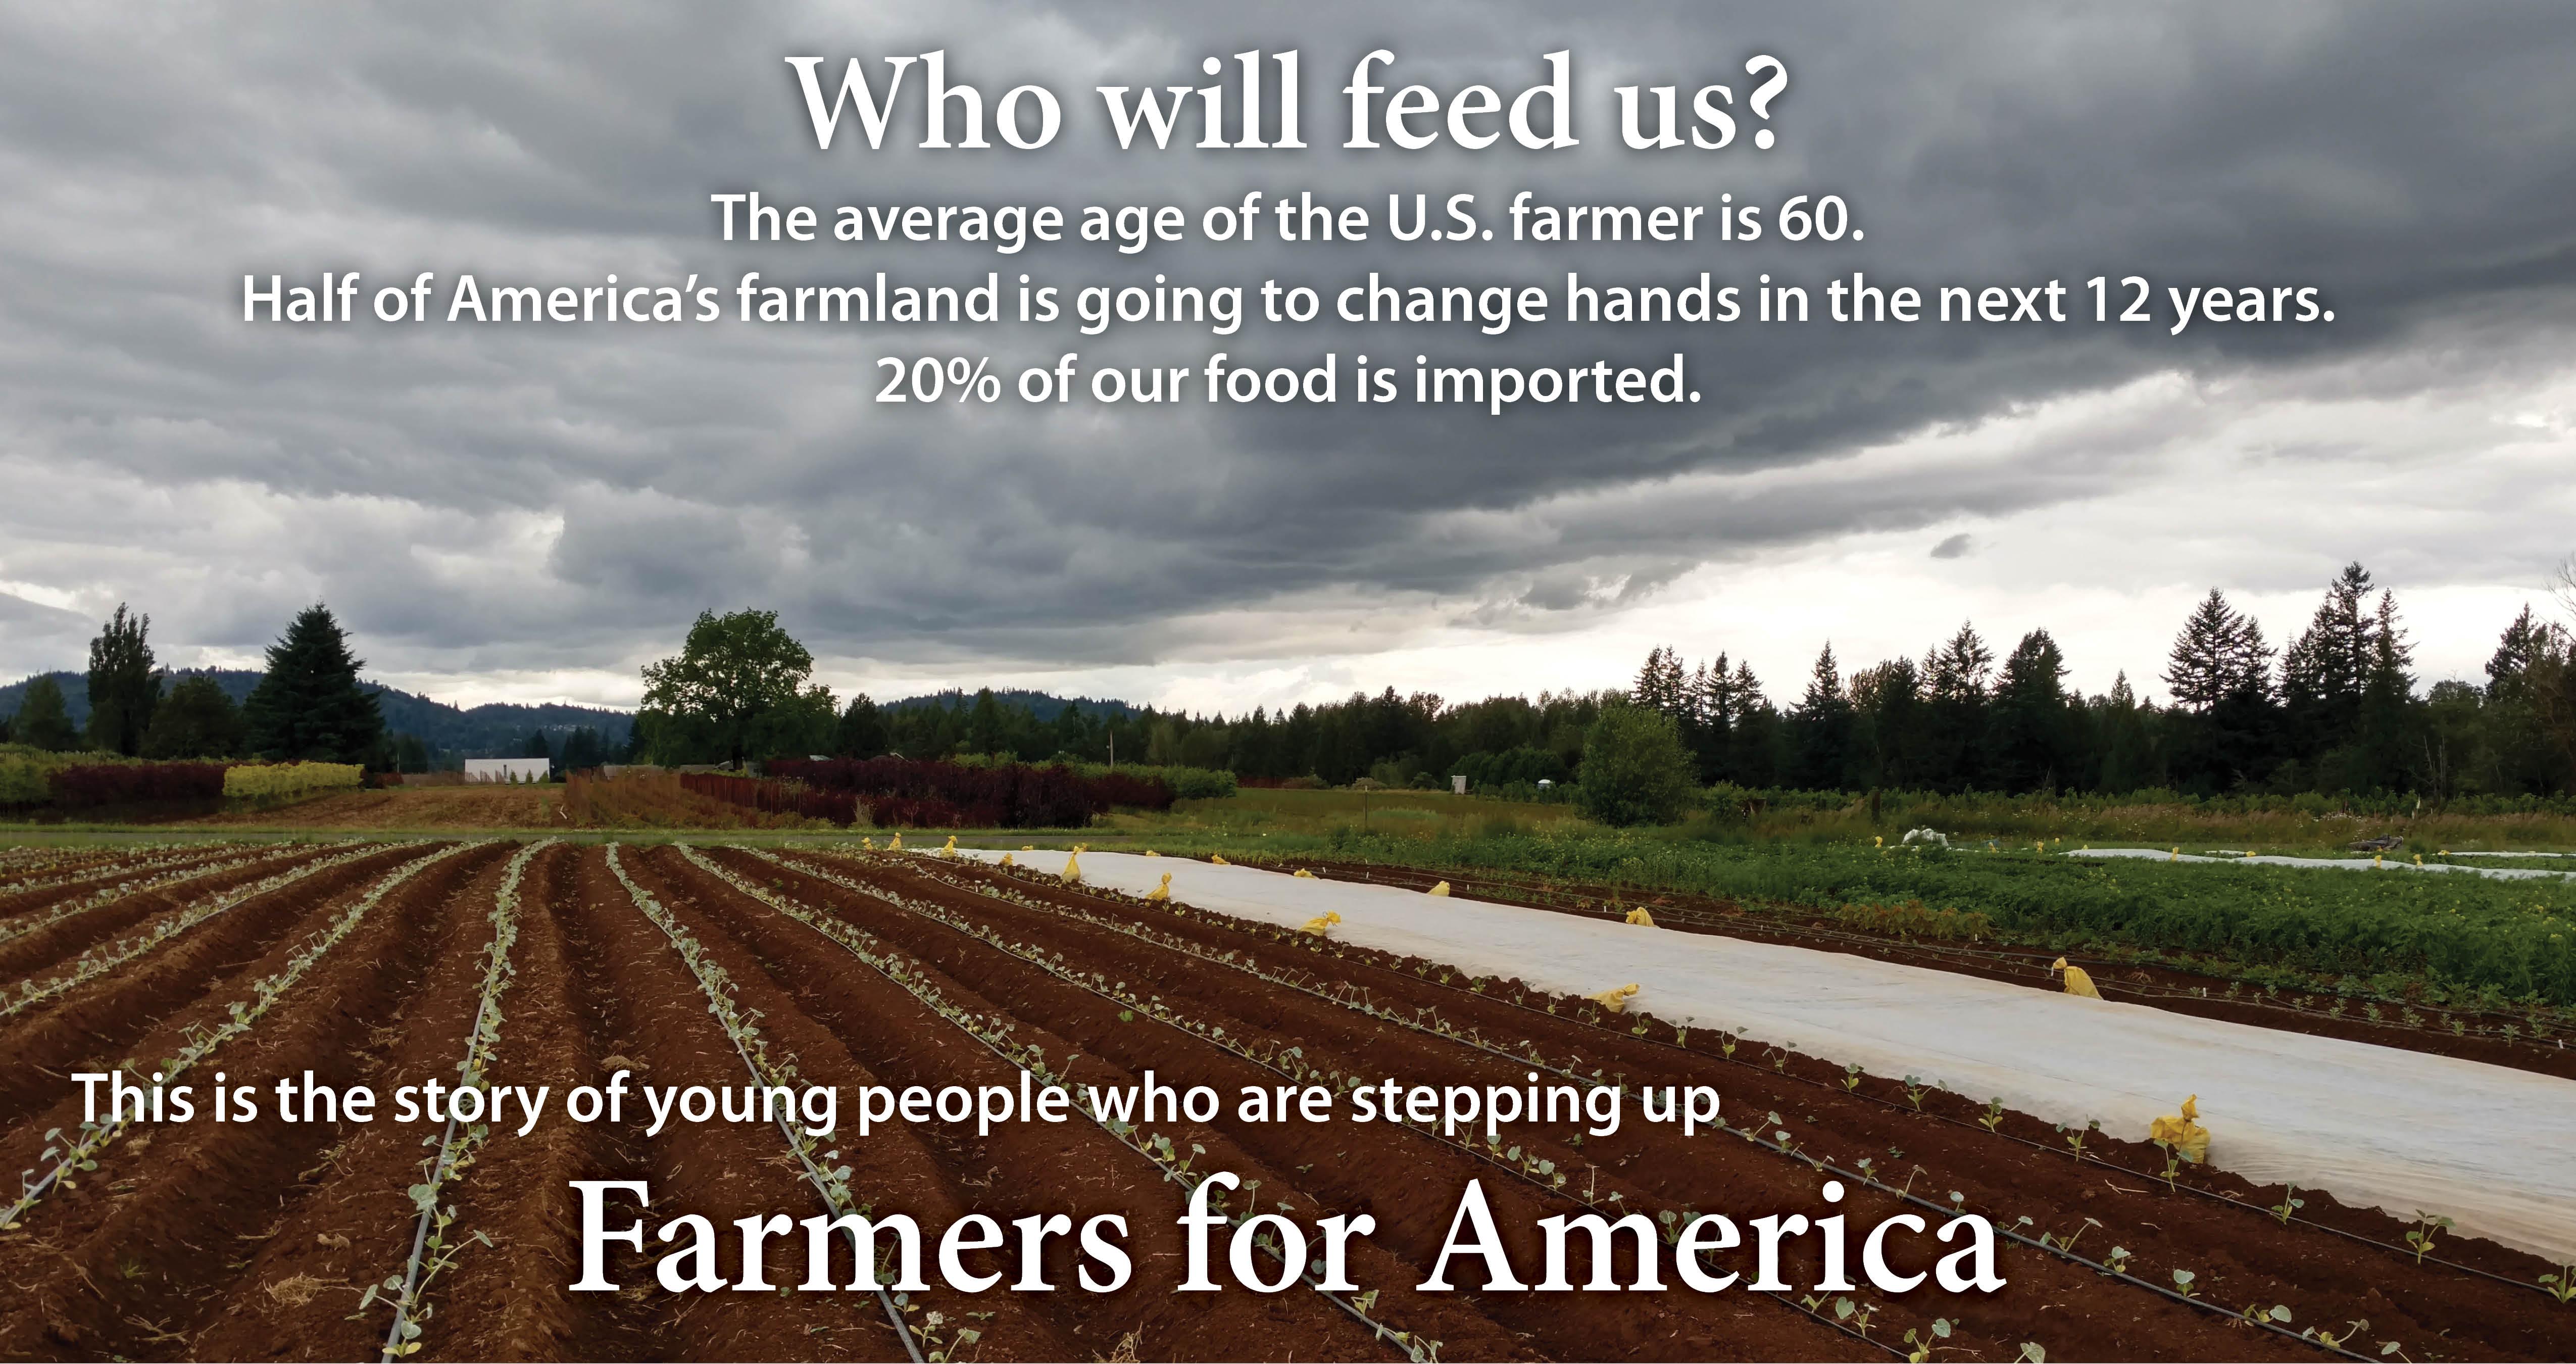 Farmers for America film